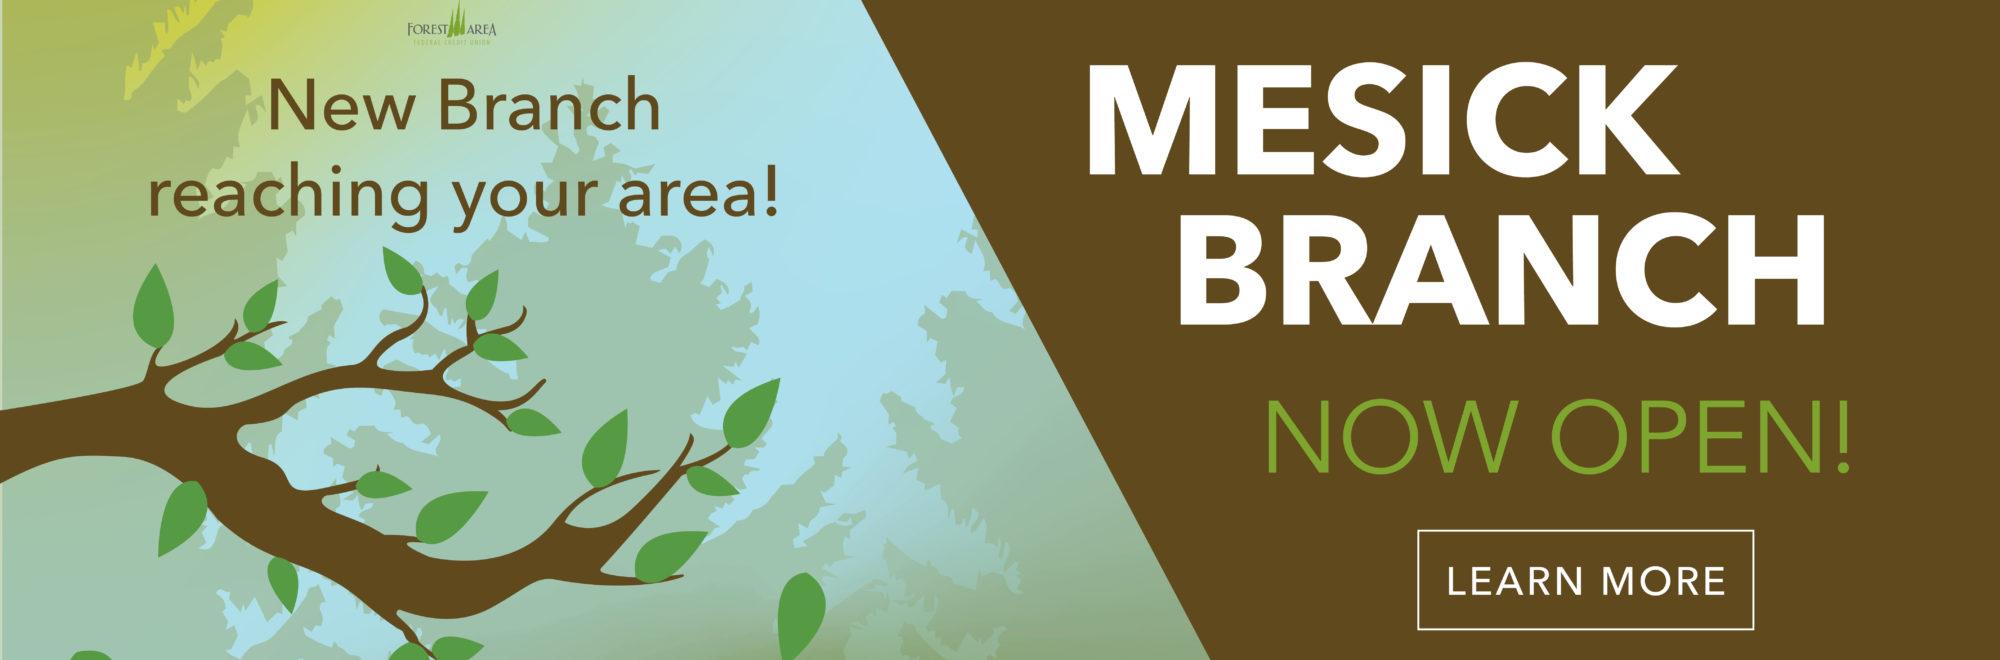 Mesick Branch Now Open